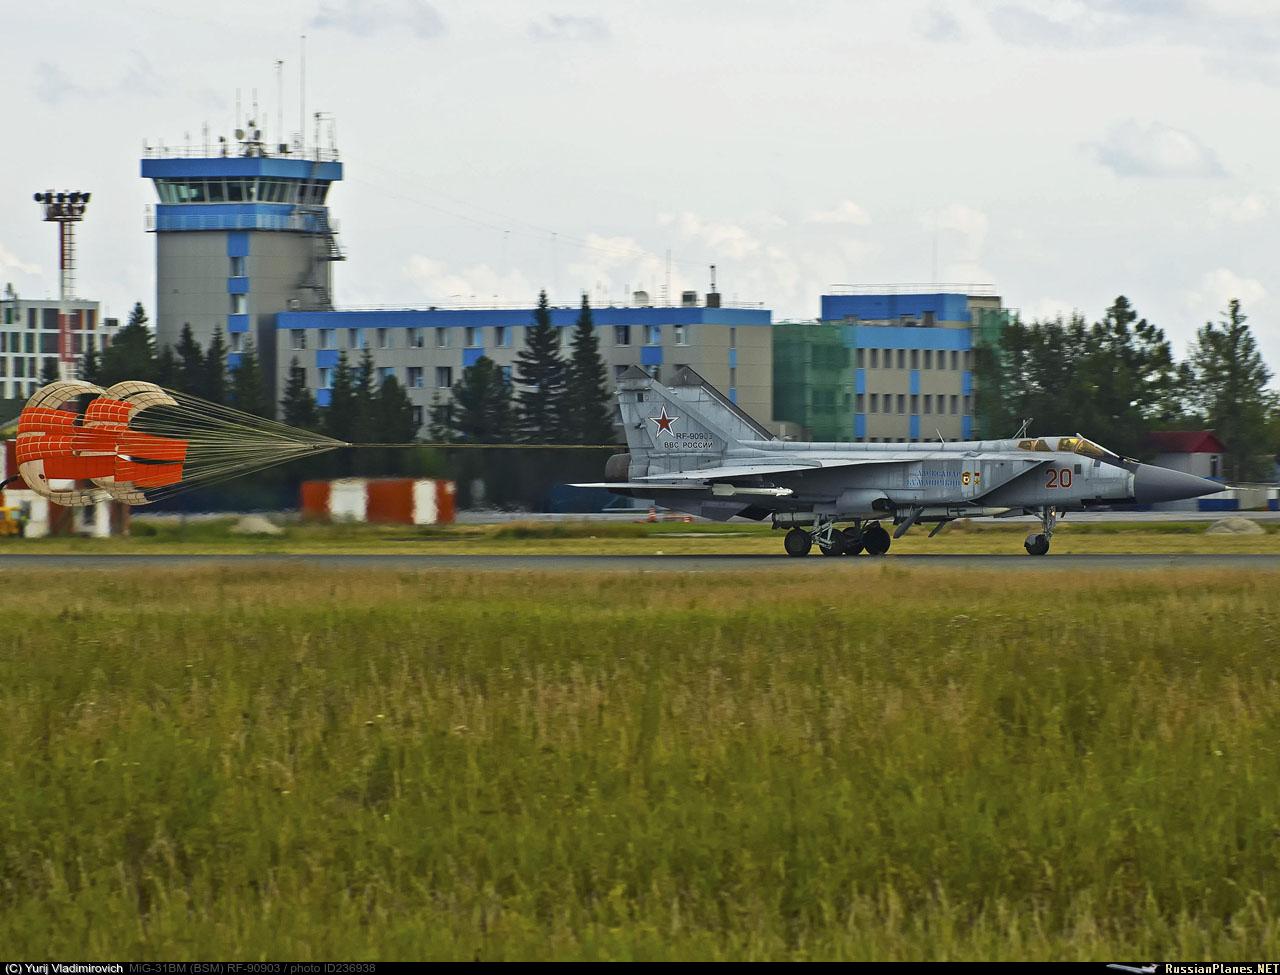 https://russianplanes.net/images/to237000/236938.jpg